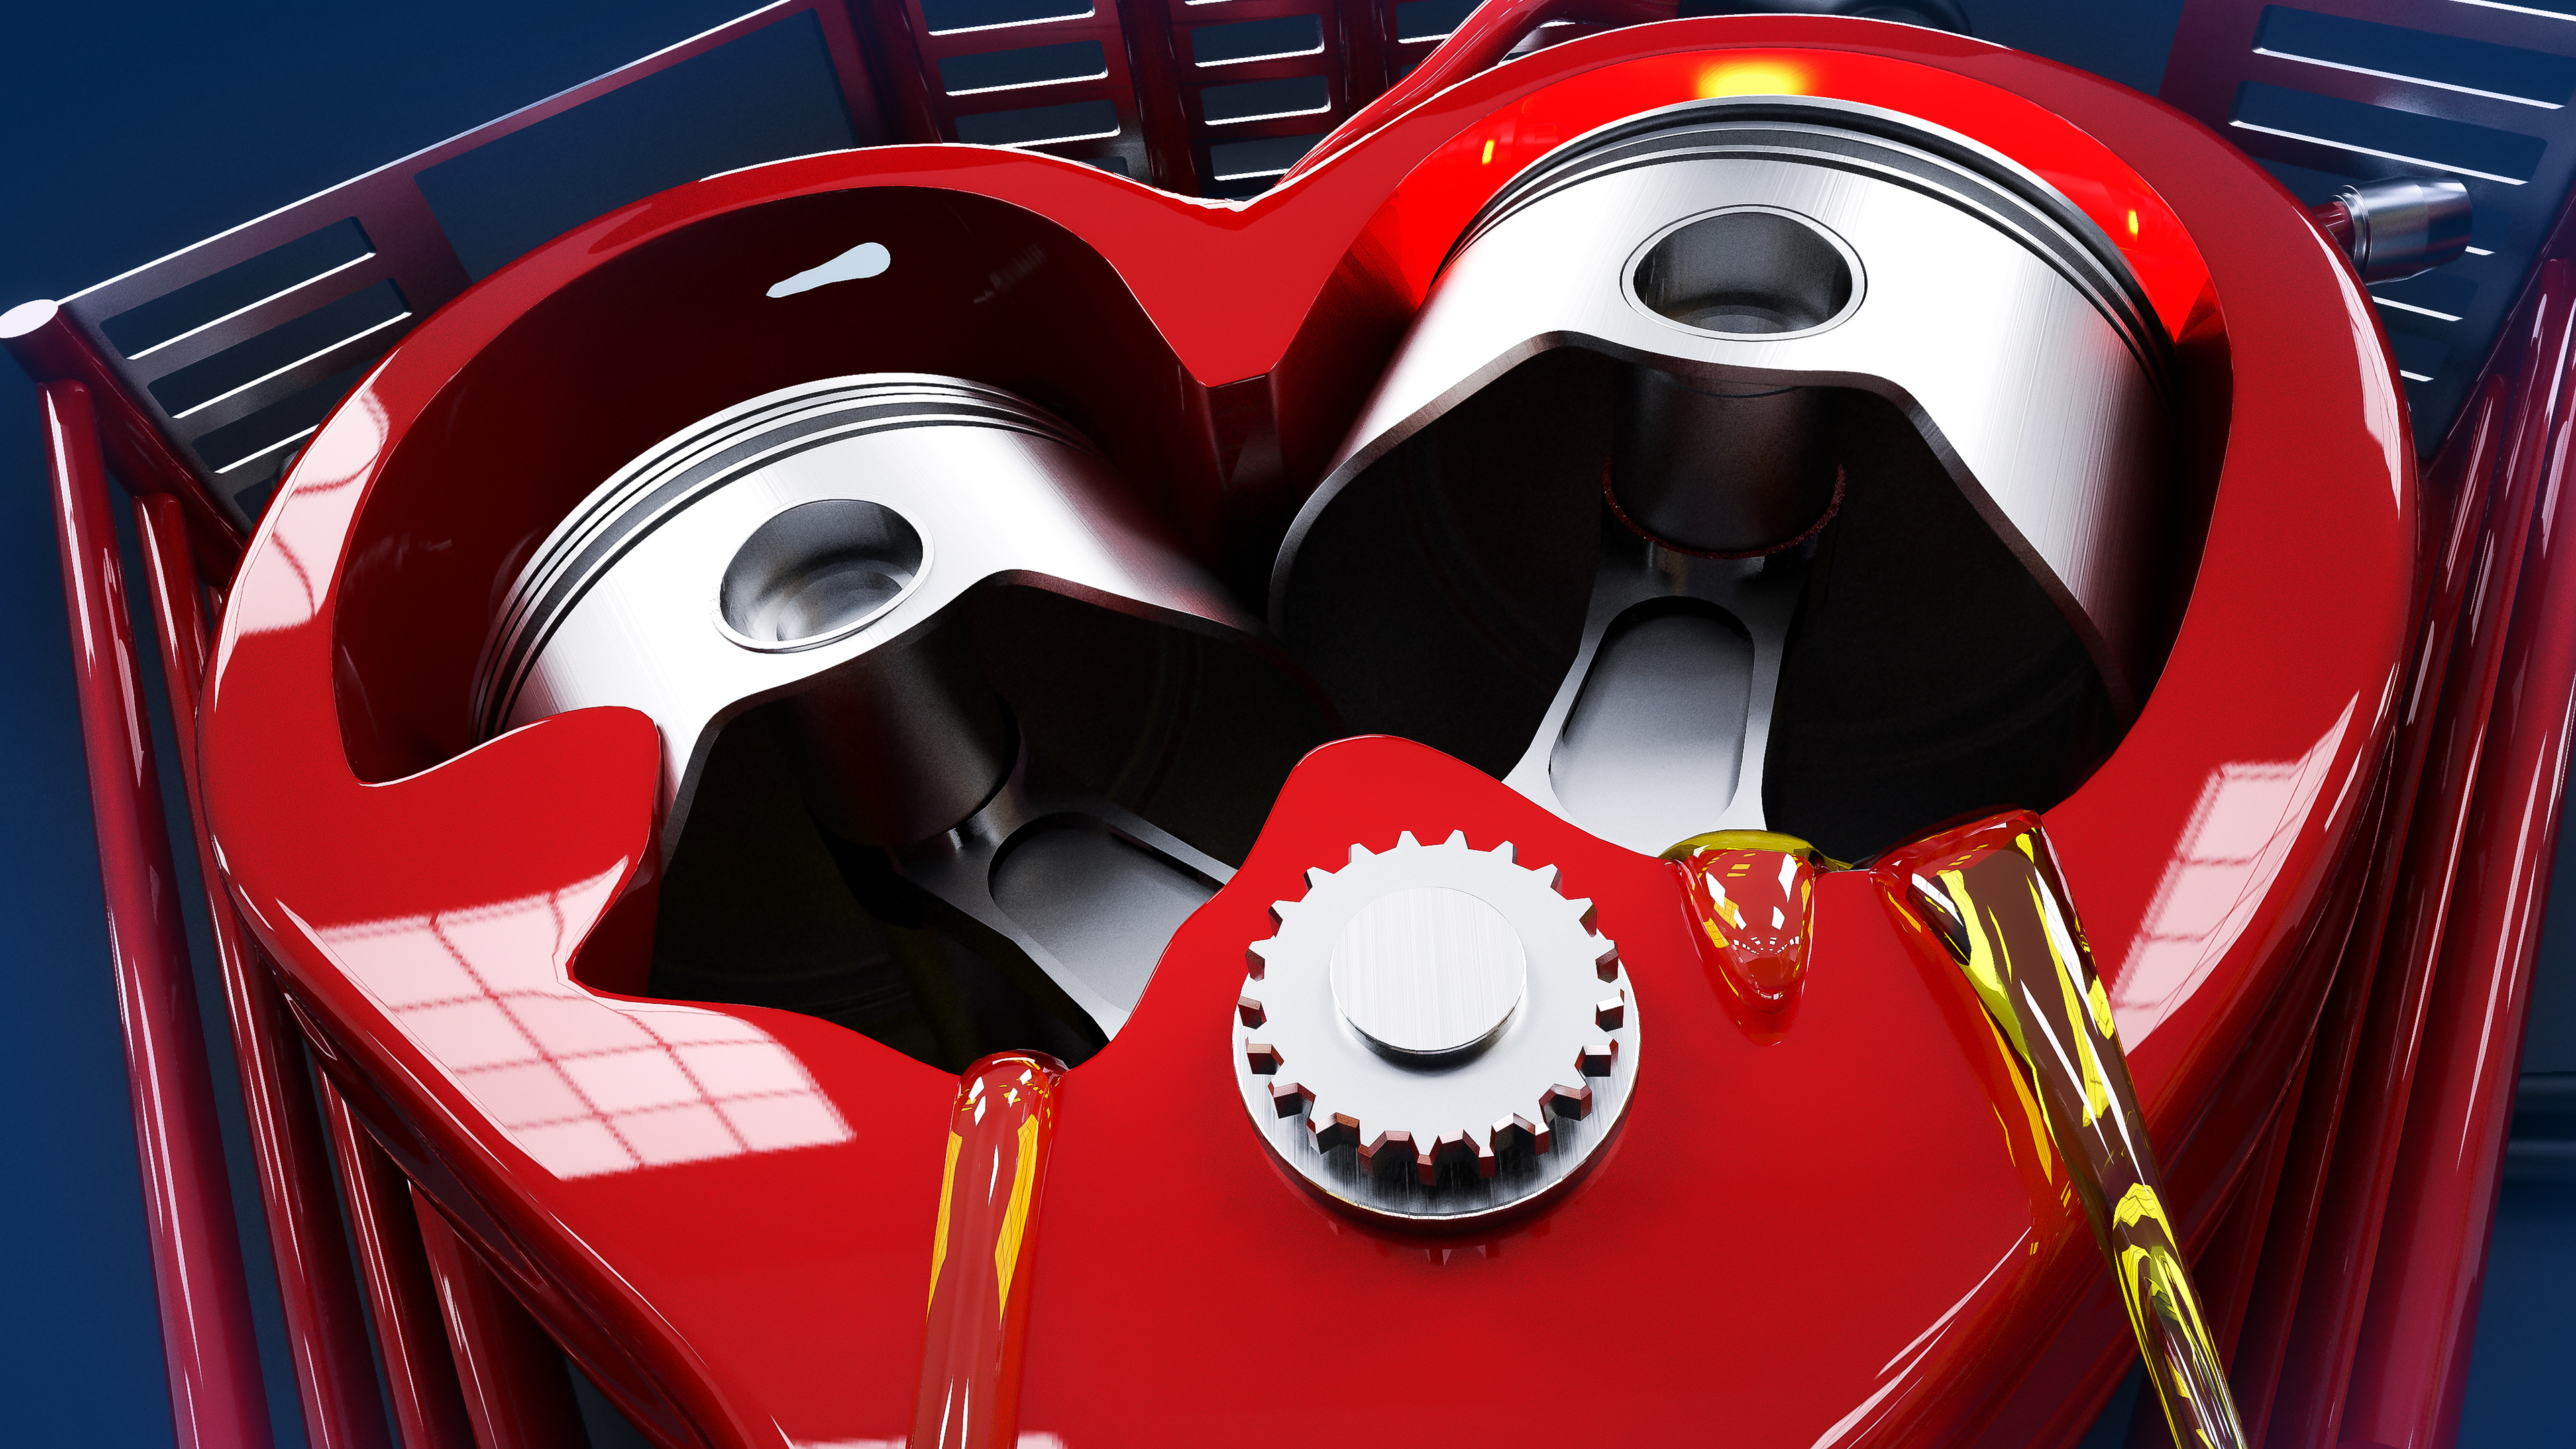 картинки сердце с мотором союз продлился